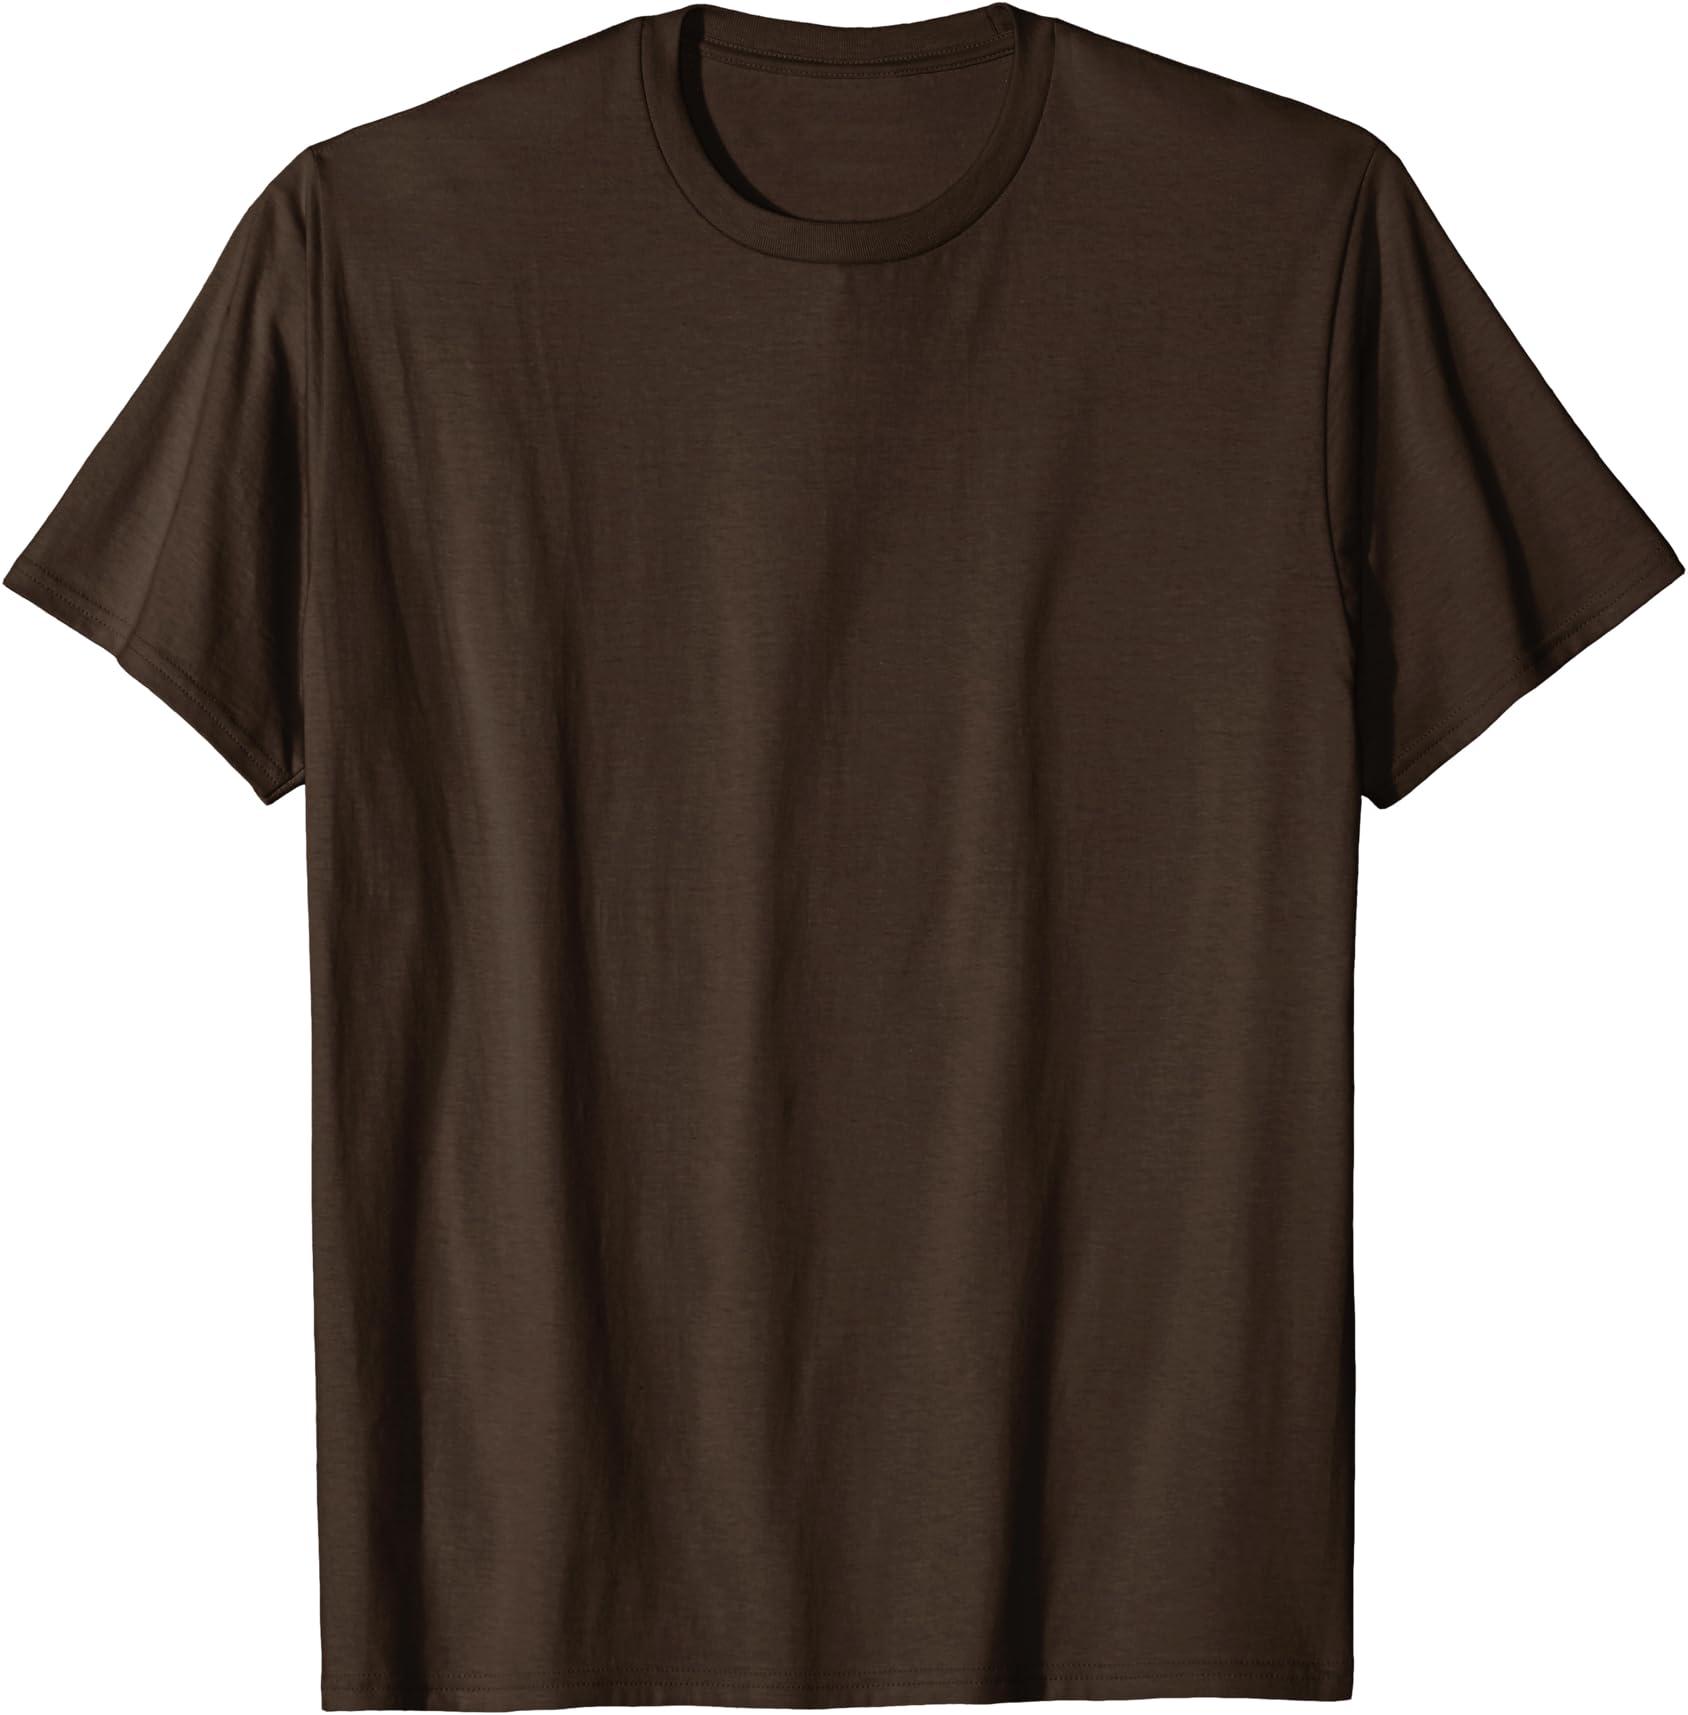 Taekwondo TKD Kid/'s 3 4 5 6 7 8 9 10 11 12 13 Martial Arts T-Shirt